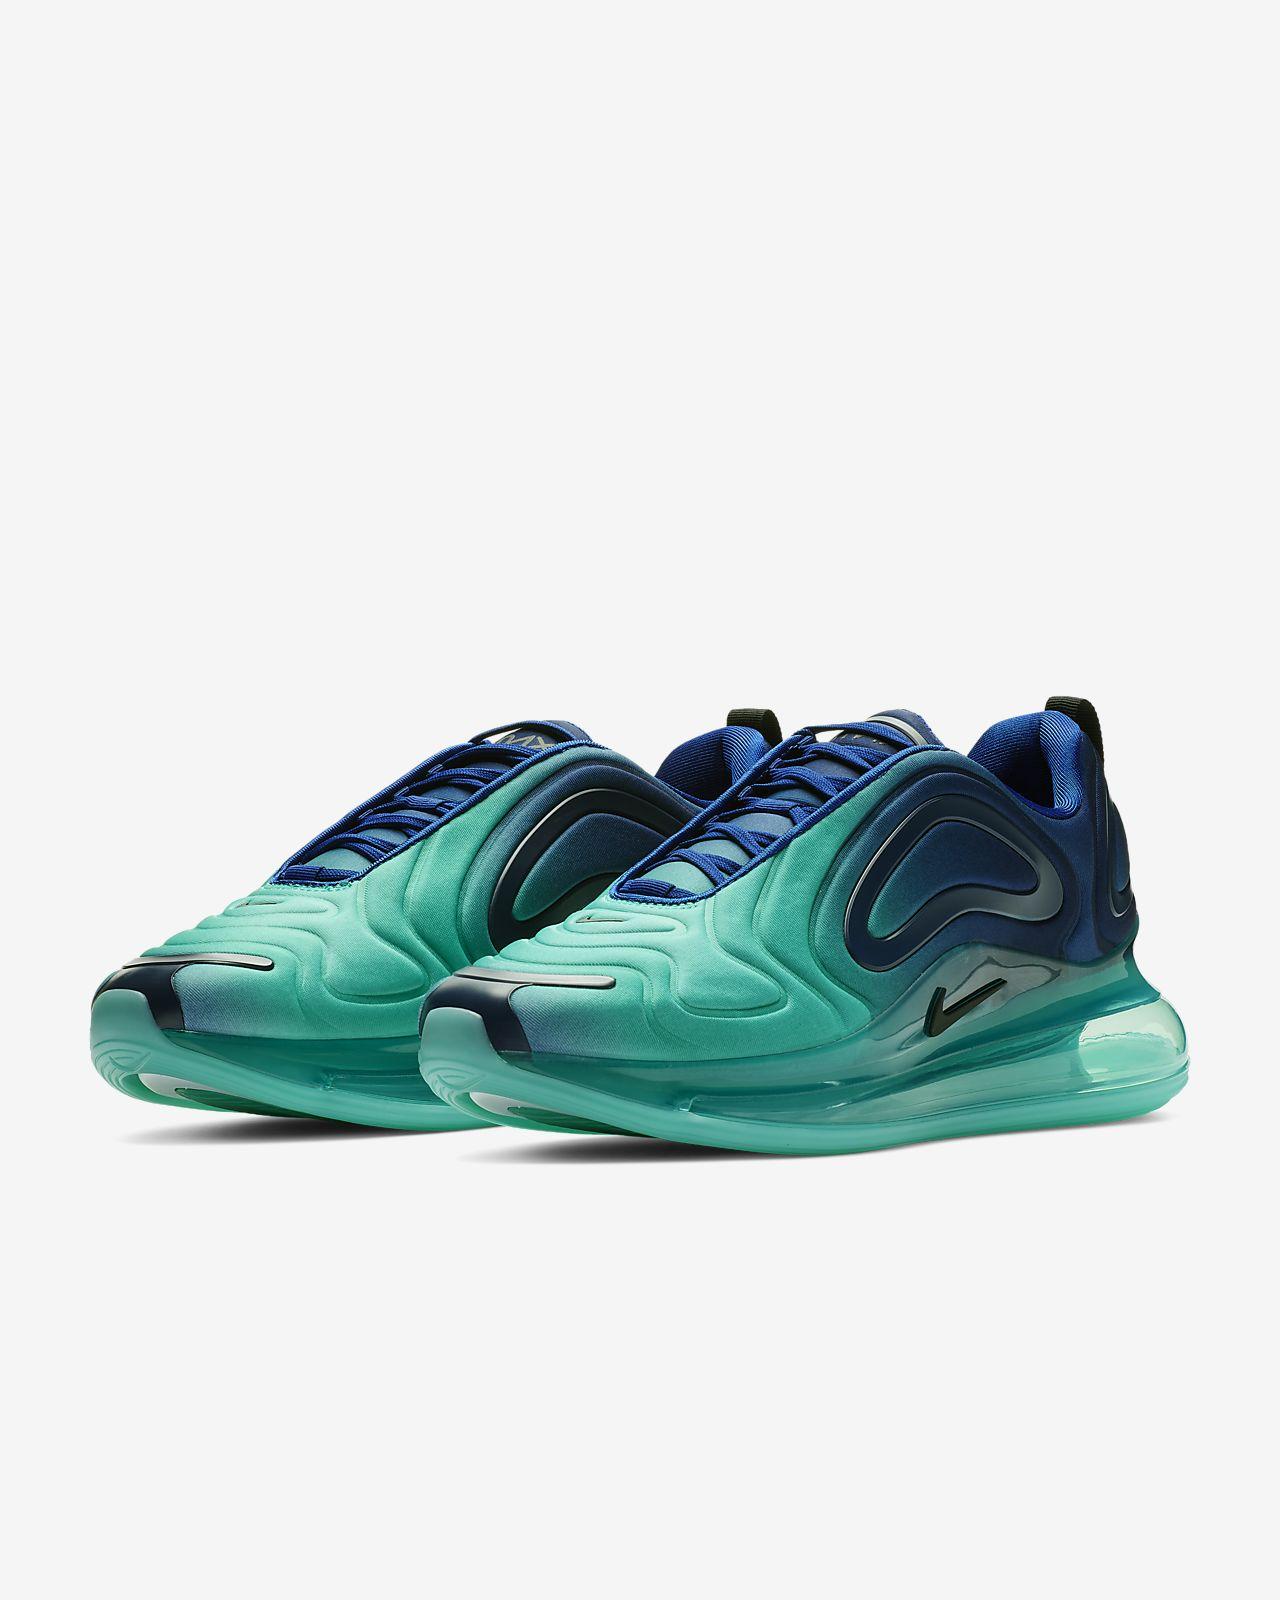 Nike Air Max 720 AO2924 400 Herren Schuhe Multi , Größe: EU